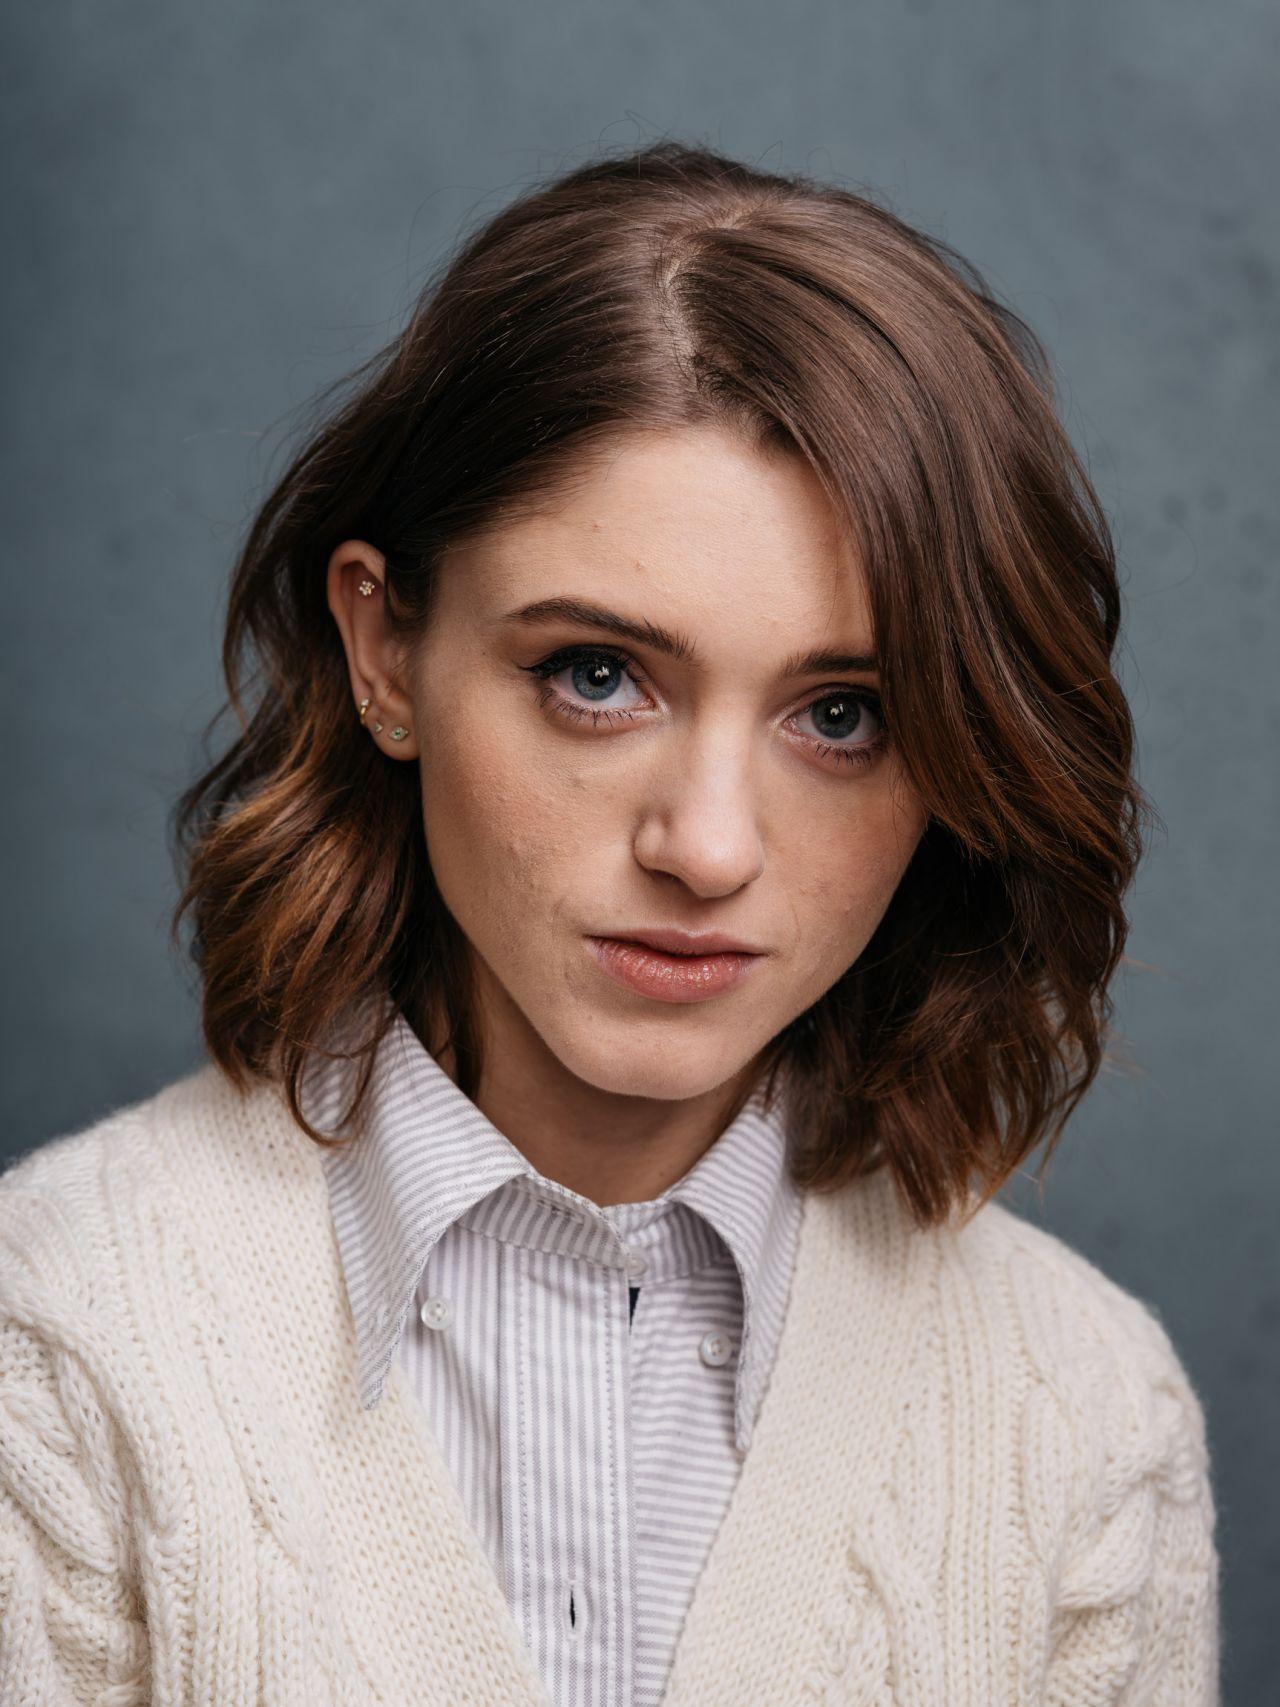 Natalia Dyer - Deadline Studios Portraits at Sundance Film